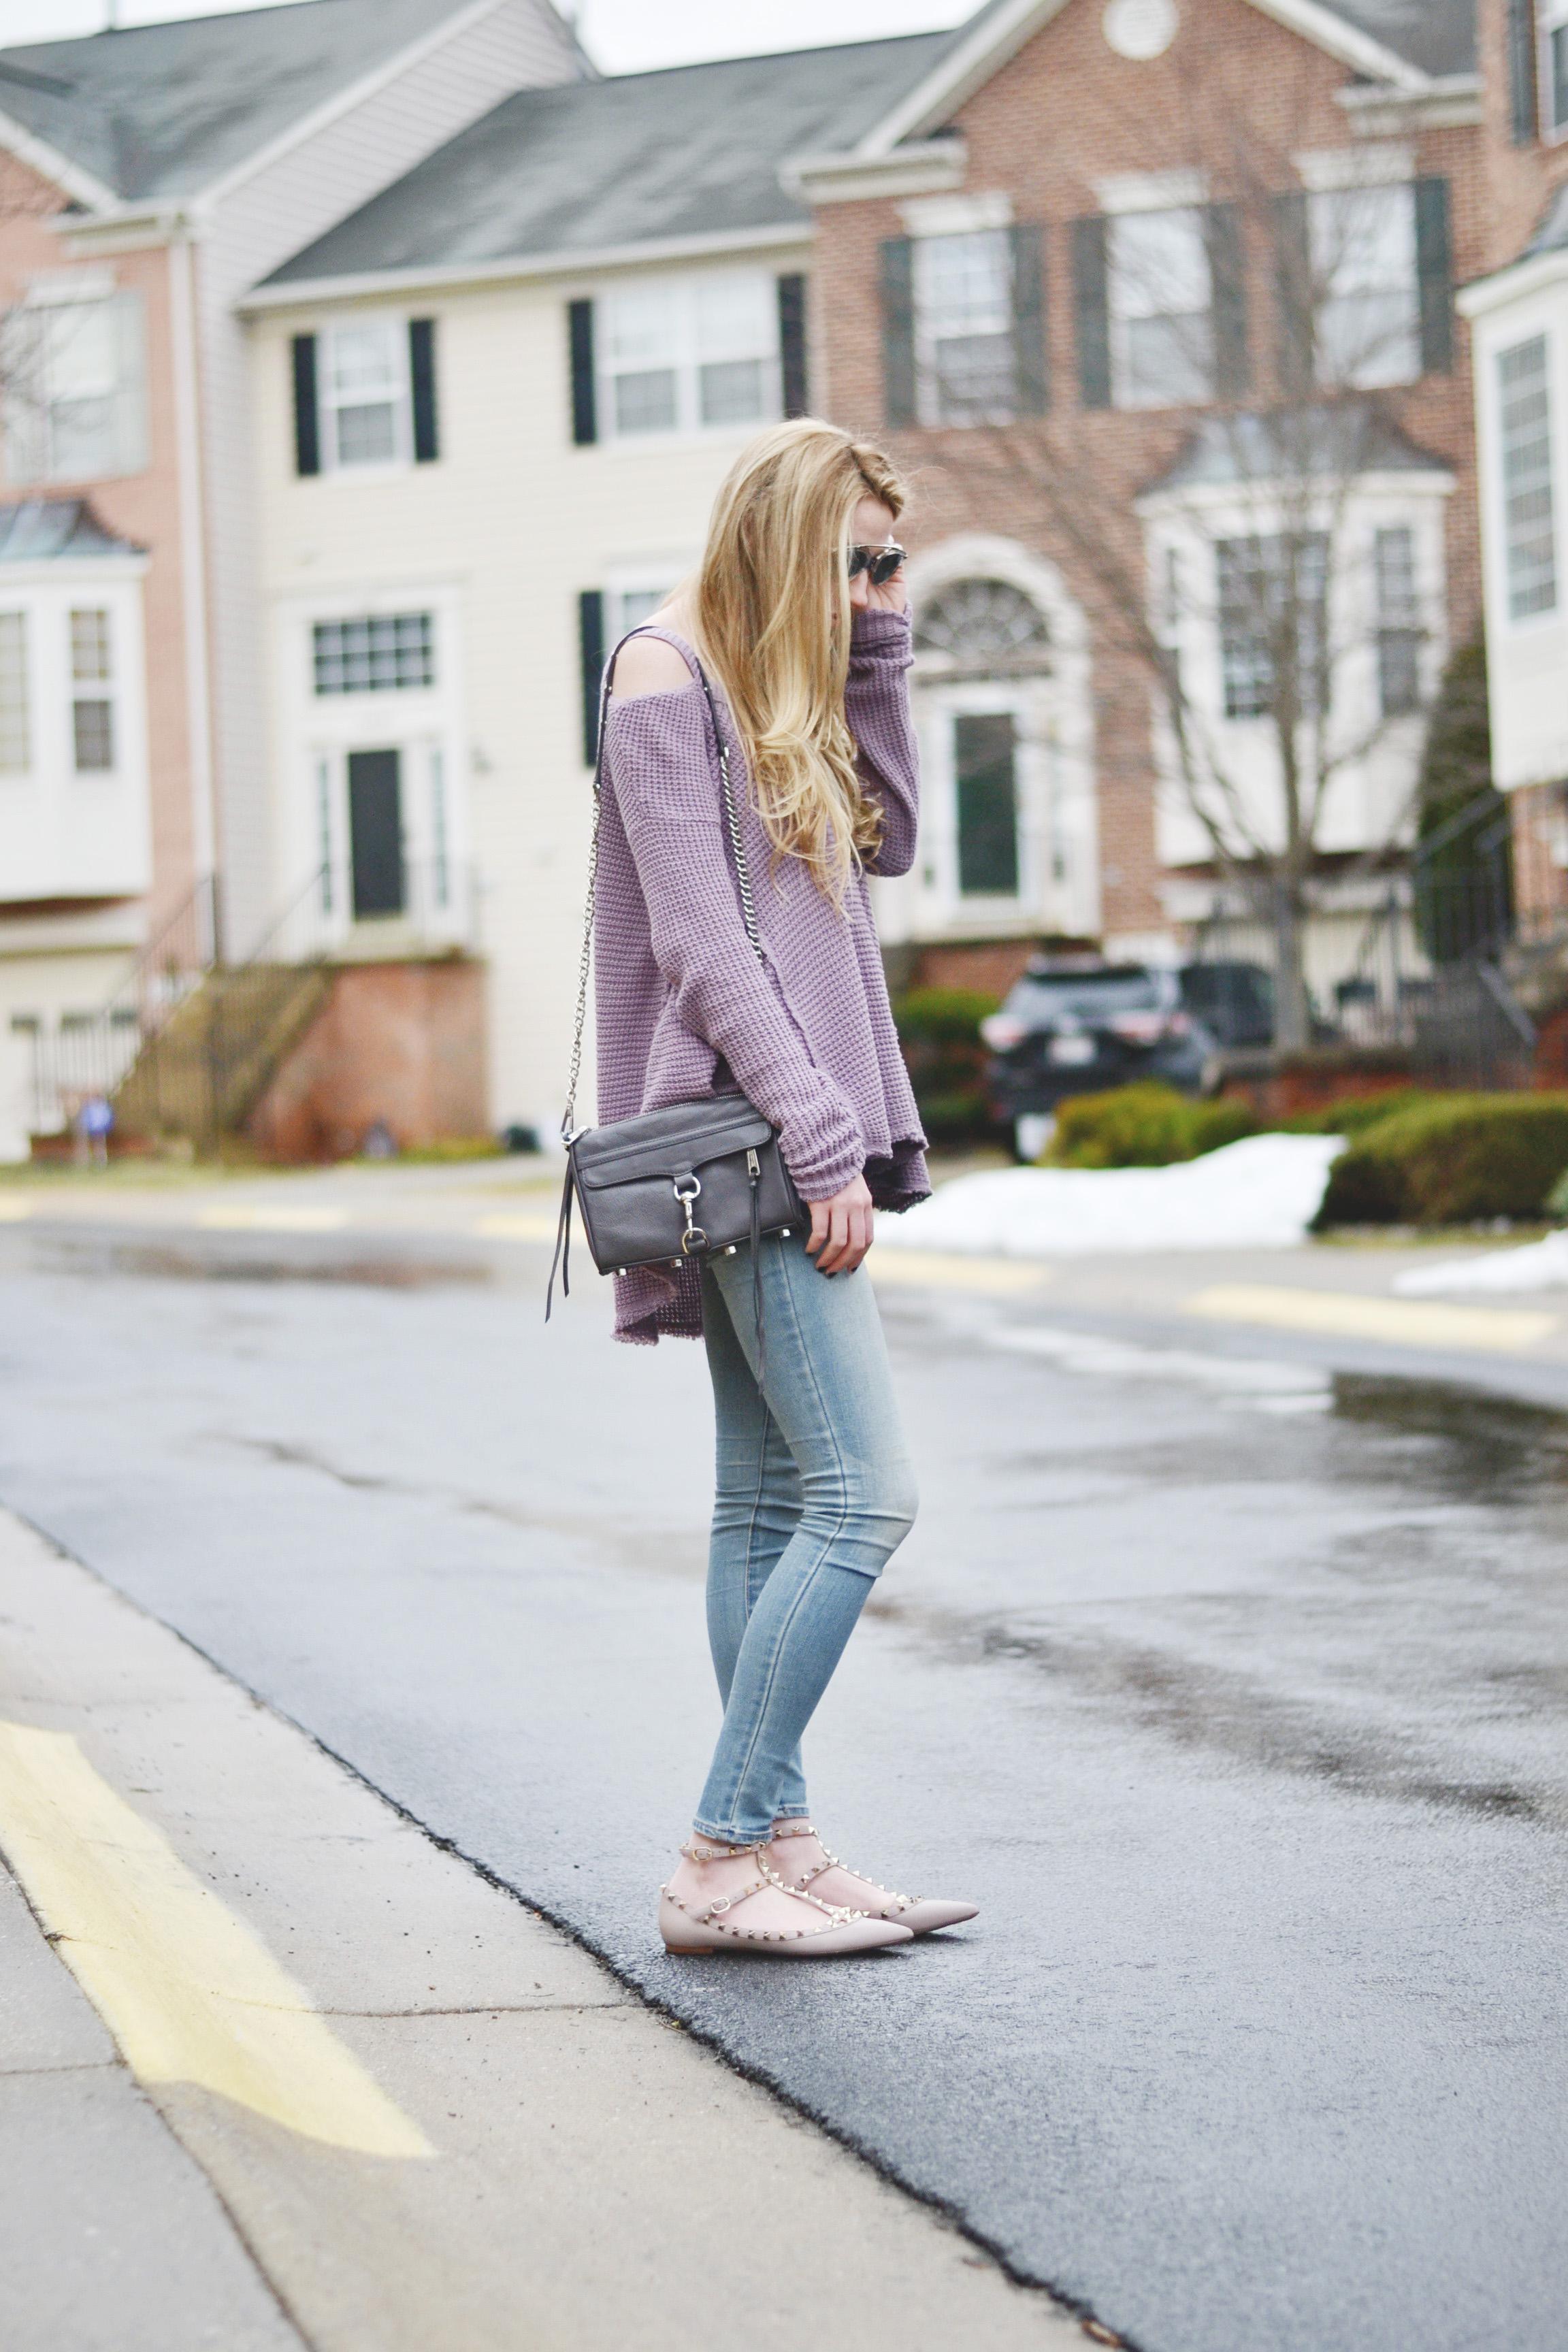 Cold Shoulder & Valentino Flats (via Girl x Garment)